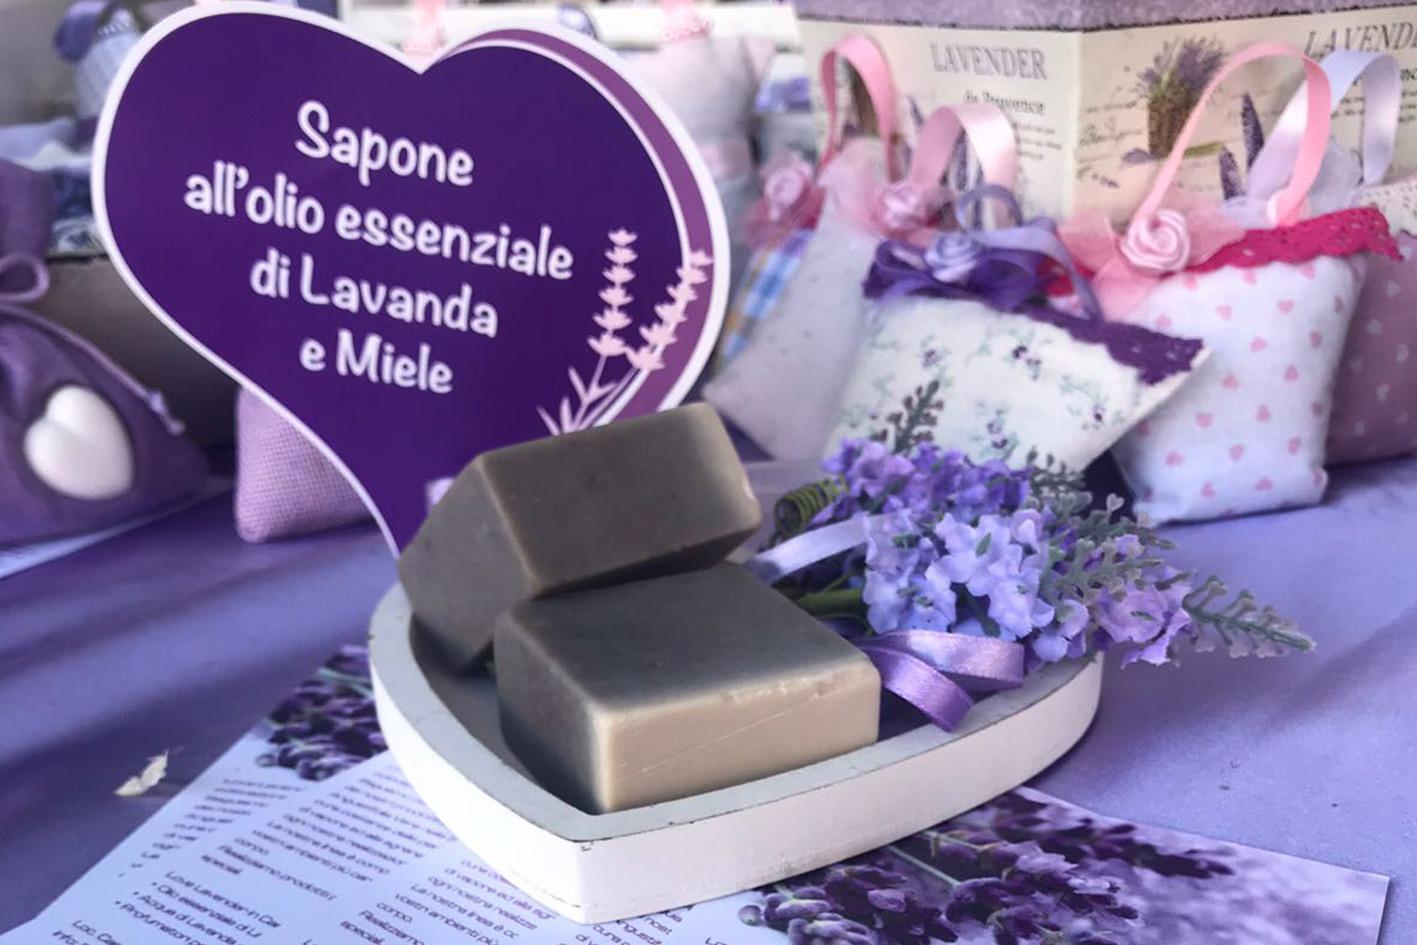 Love Levander in Casentino 7